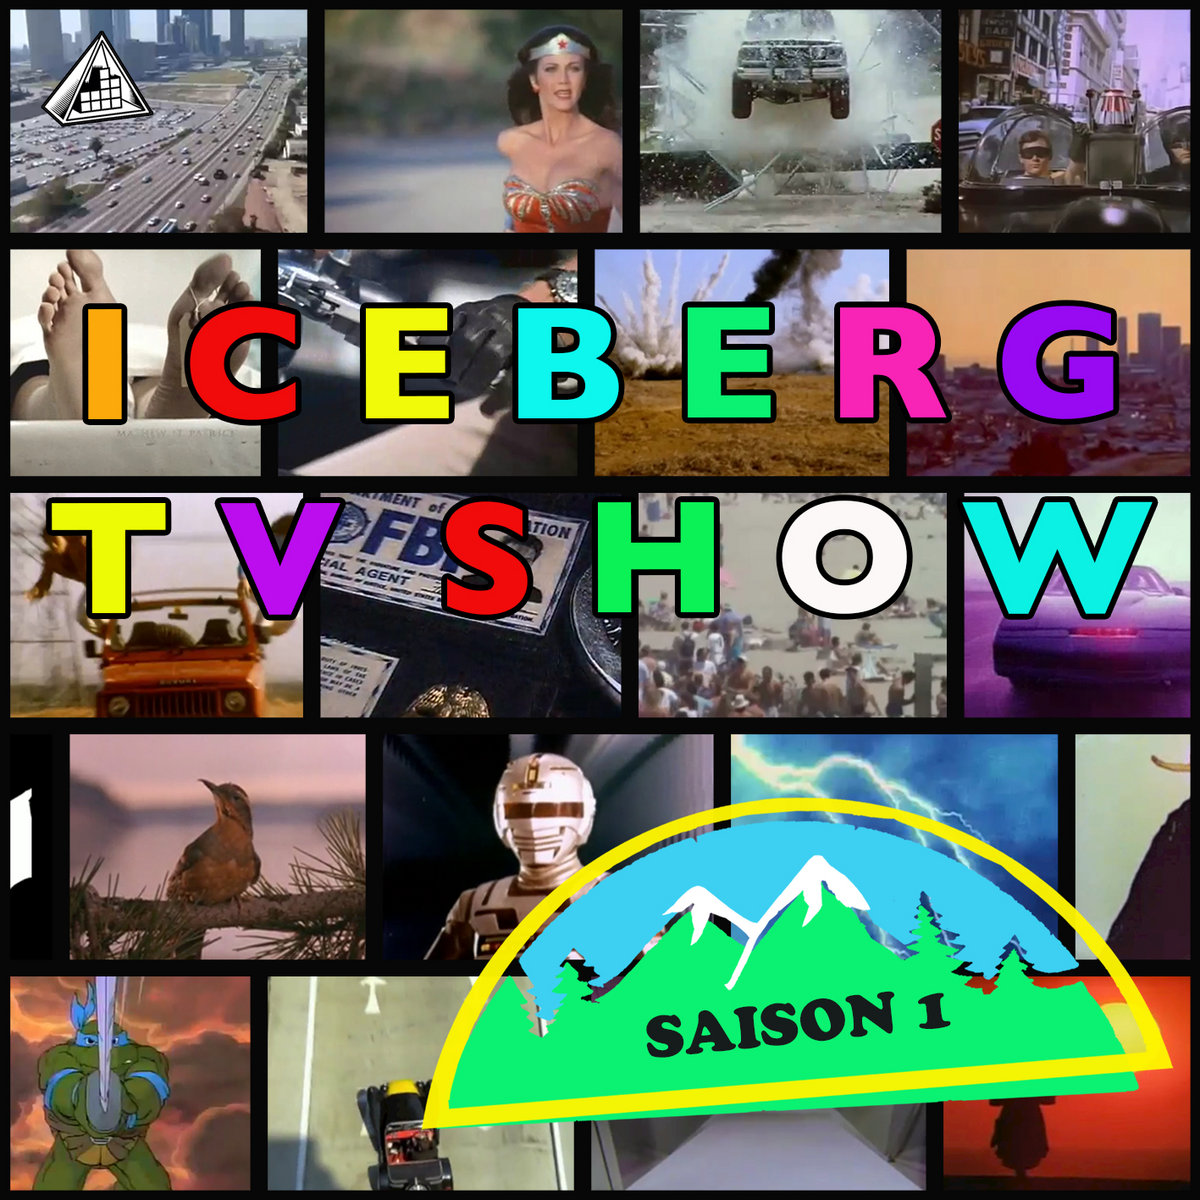 Iceberg TV Show